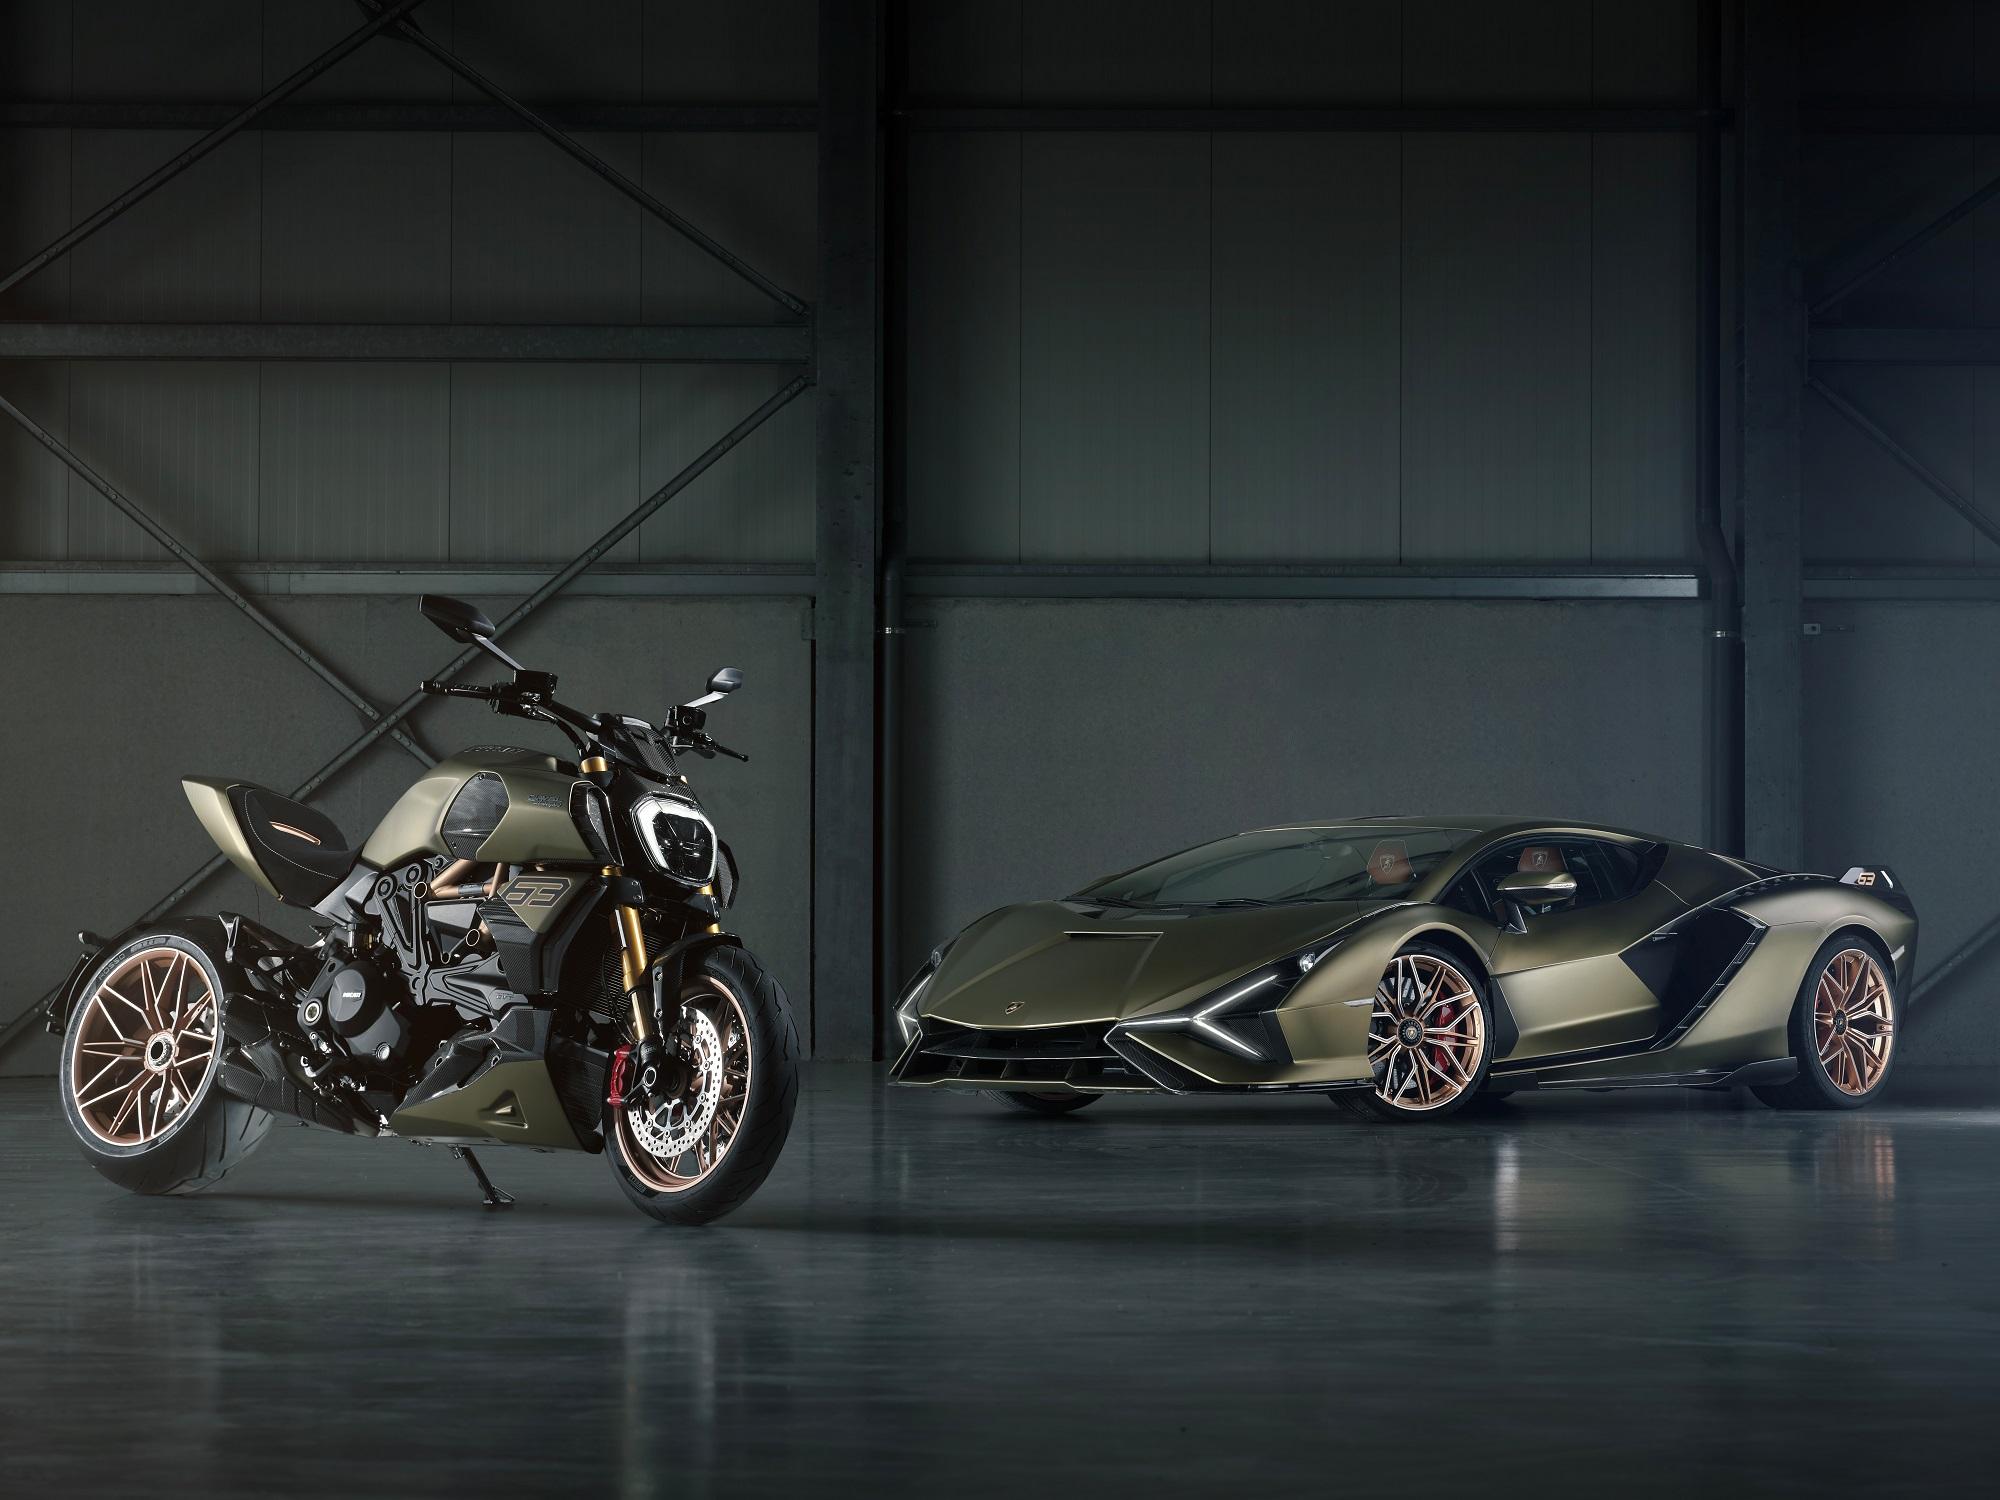 Ducati Diavel 1260 Lamborghini, inspired by the Sián FKP 37